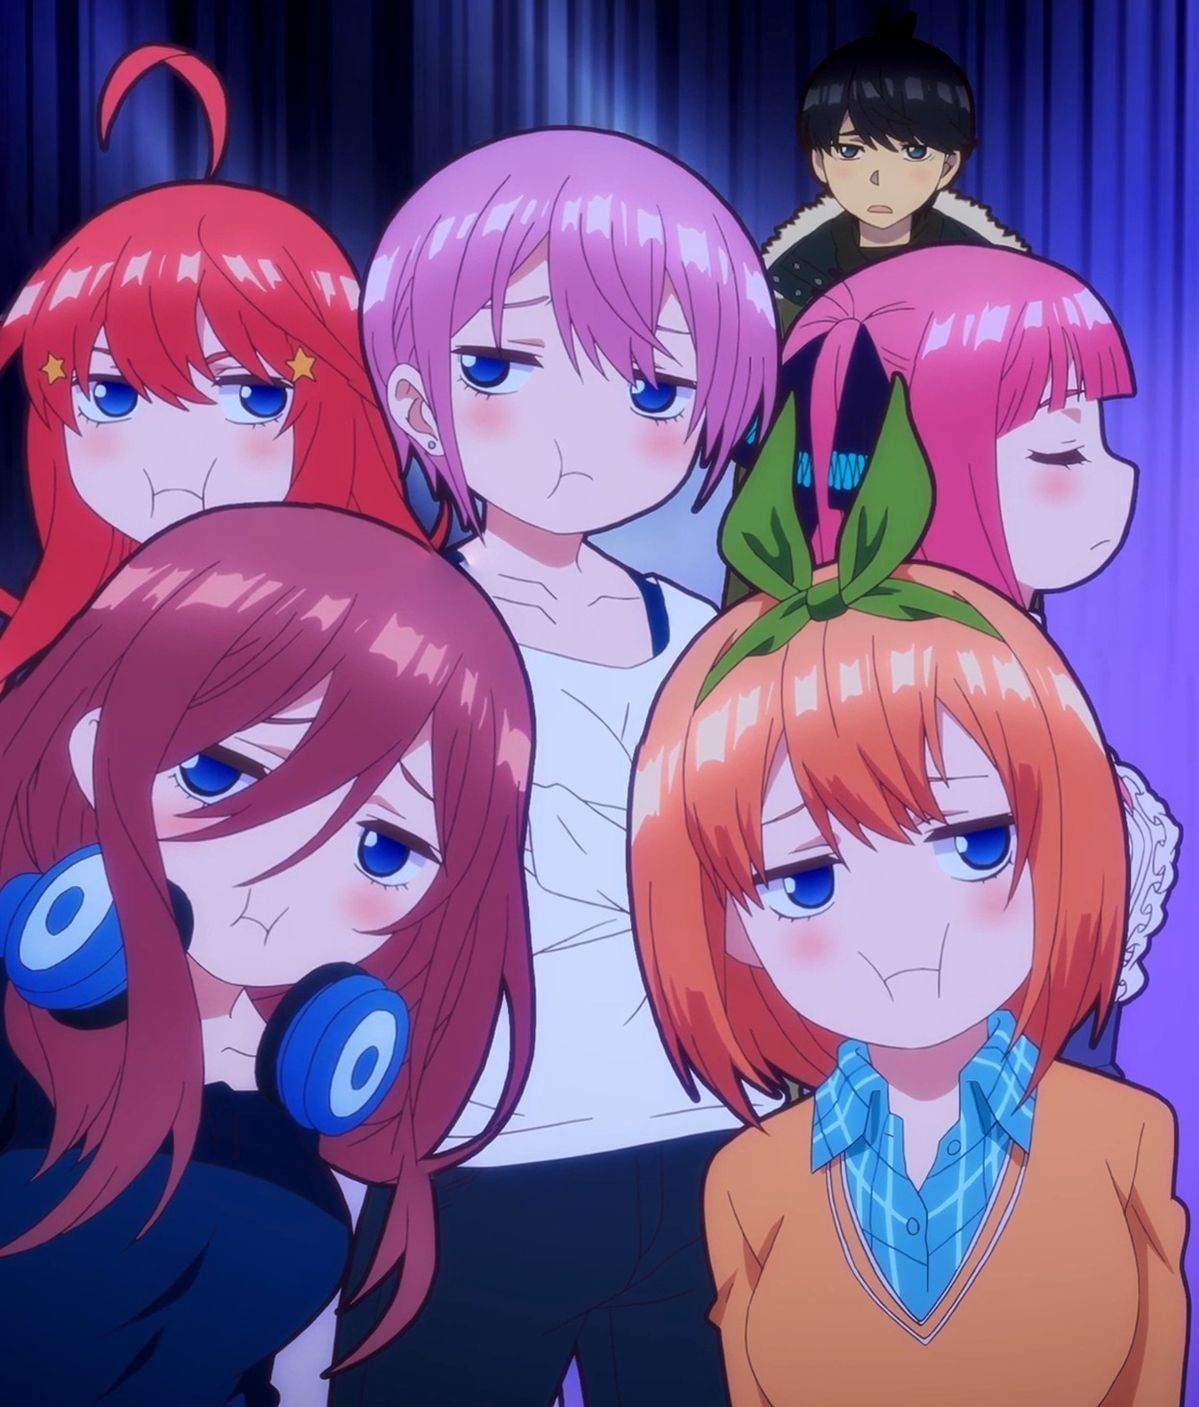 Pin on 5toubun no Hanayome Manga